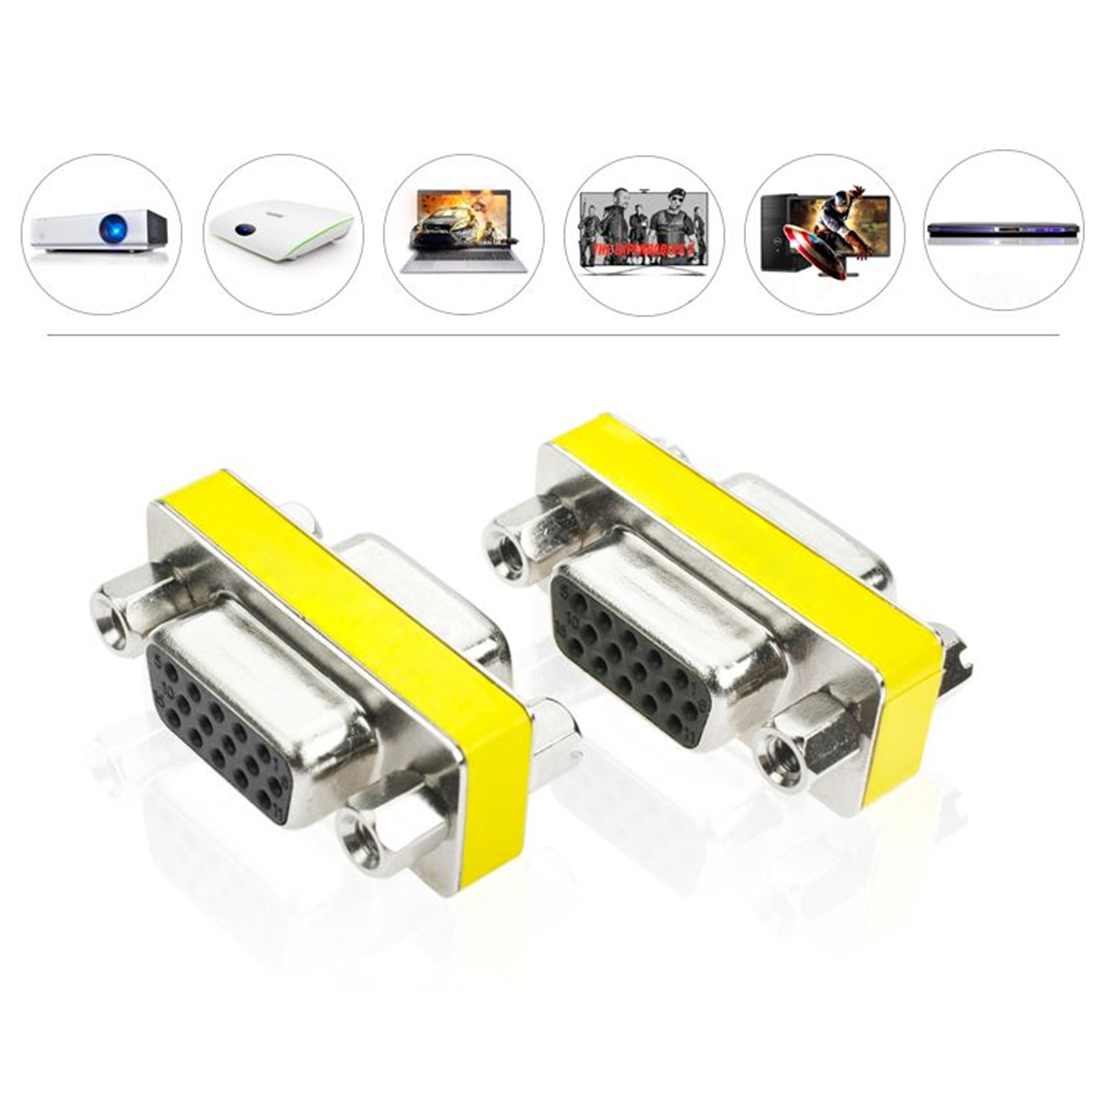 New Hight Quality Female To Female VGA HD15 Pin Gender Changer Converter Adapter VGA Female Adapter